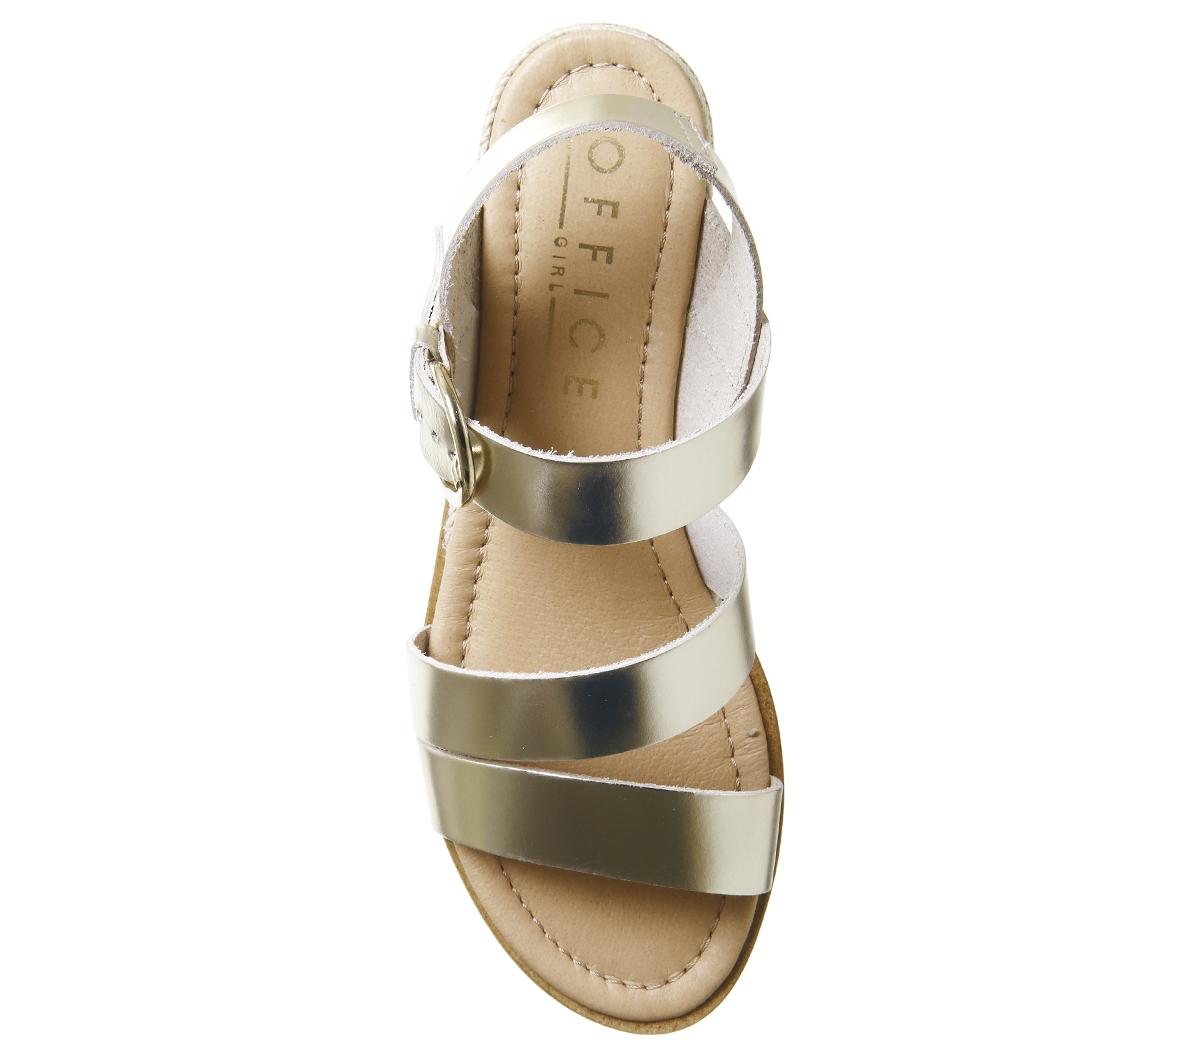 Damenschuhe Office Saltlake Ankle Strap Strap Strap Sandales GOLD LEATHER Sandales e996b8